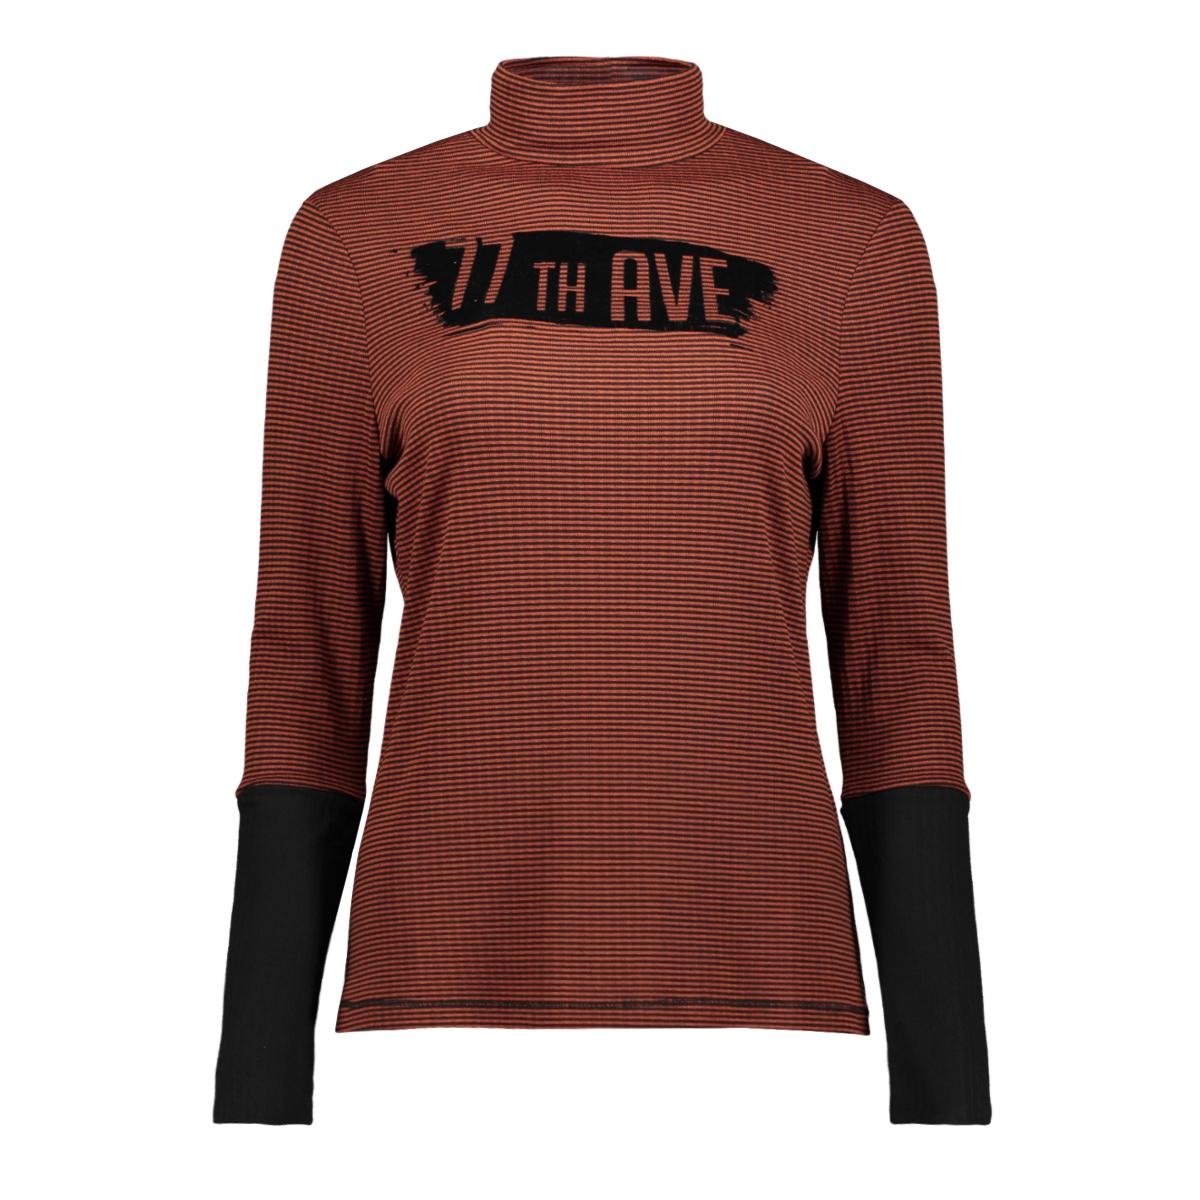 donna stiped print blouse 195 zoso t-shirt burnt orange/black